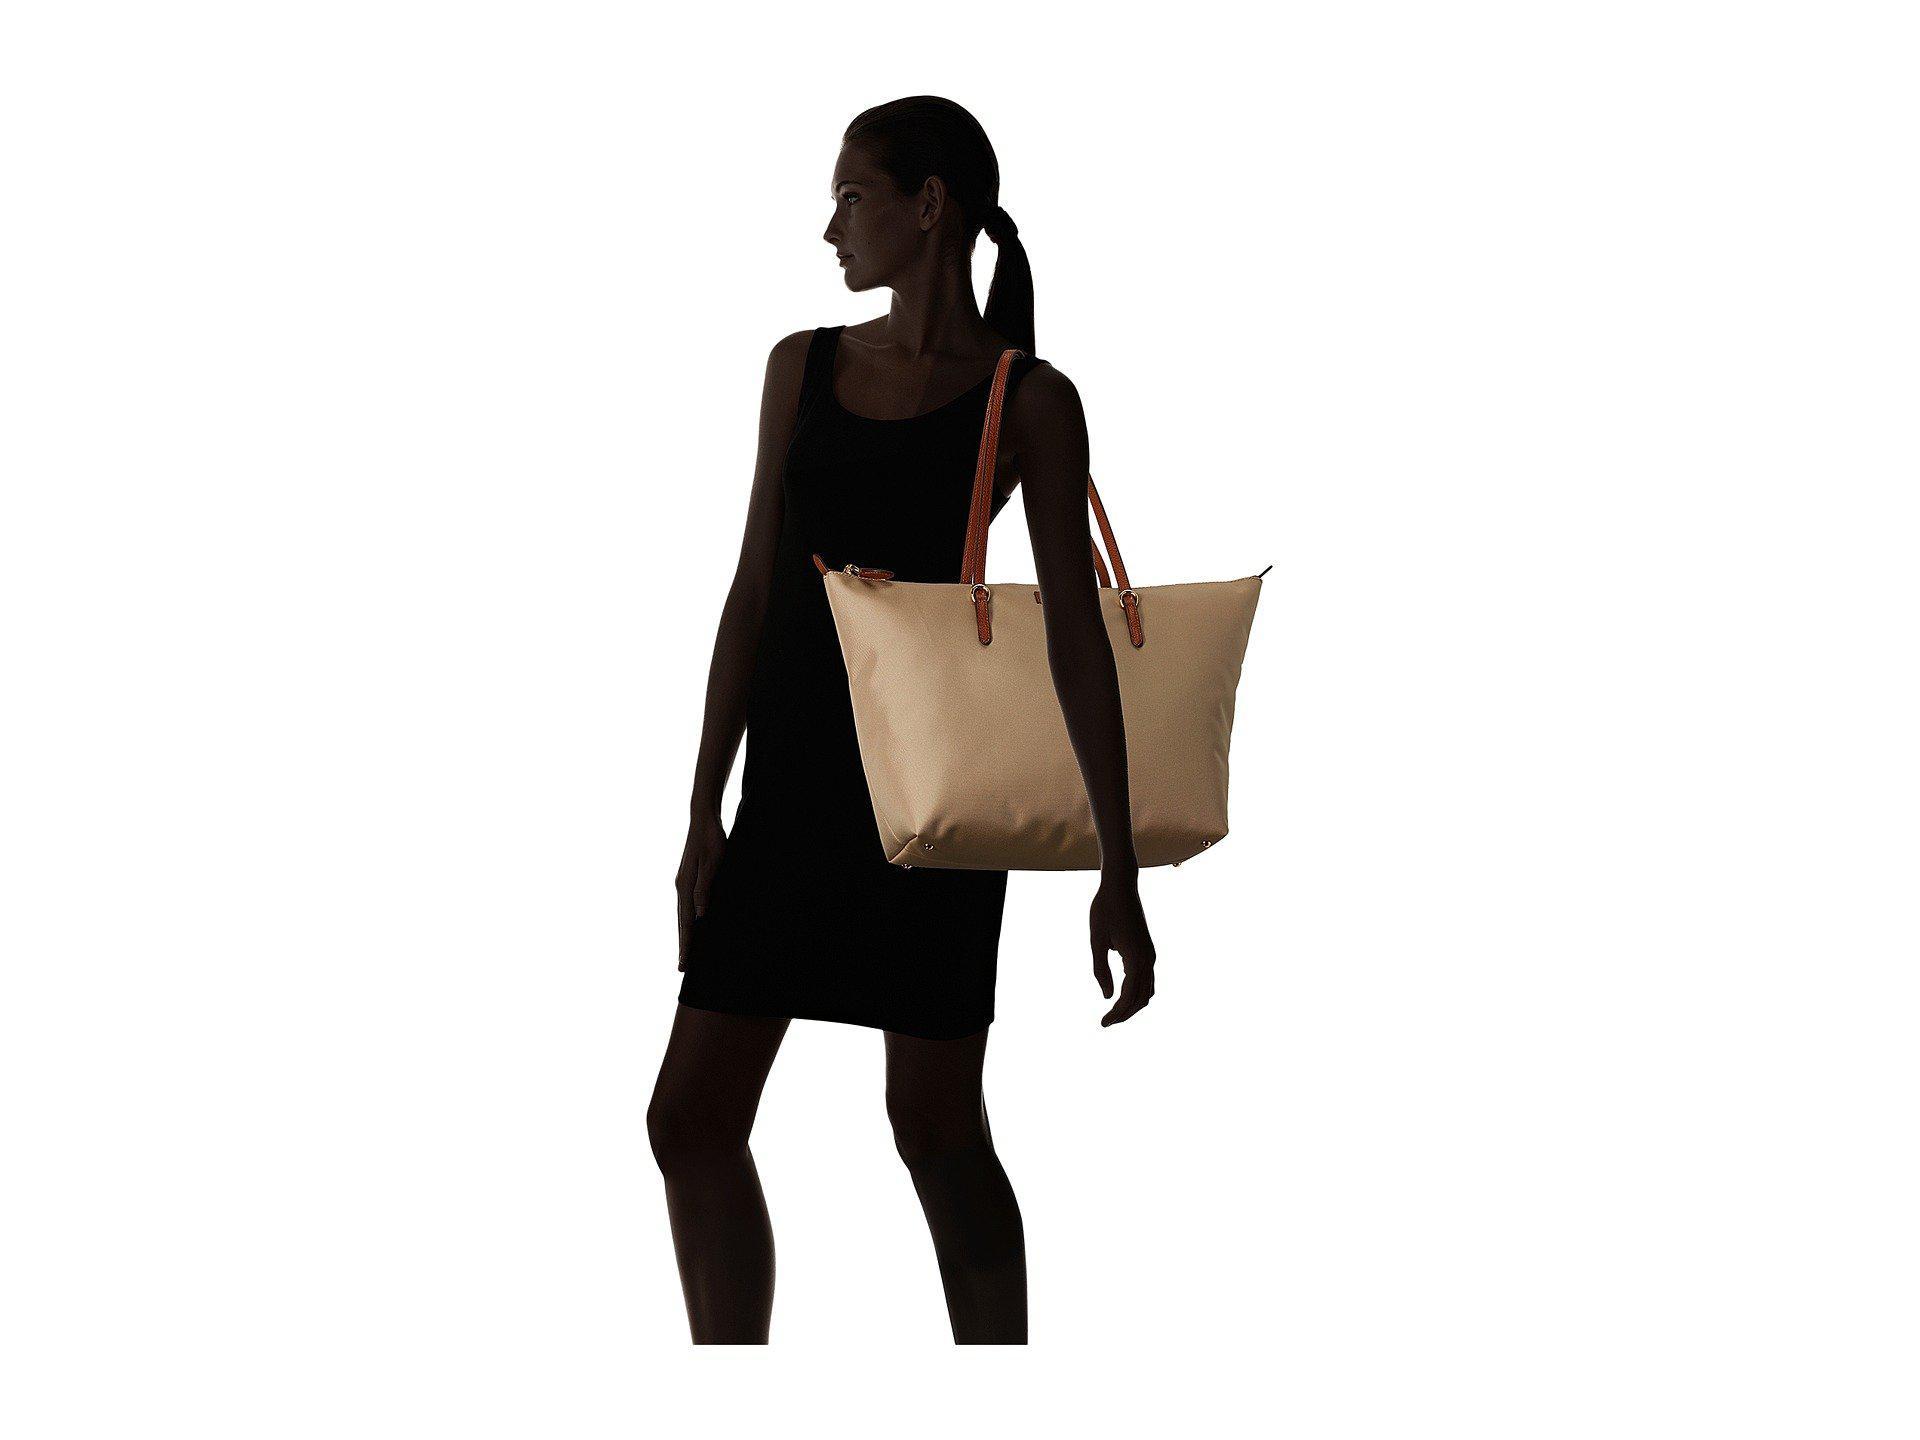 e07b6e80d Lauren by Ralph Lauren Chadwick Tote Medium (black) Tote Handbags in ...